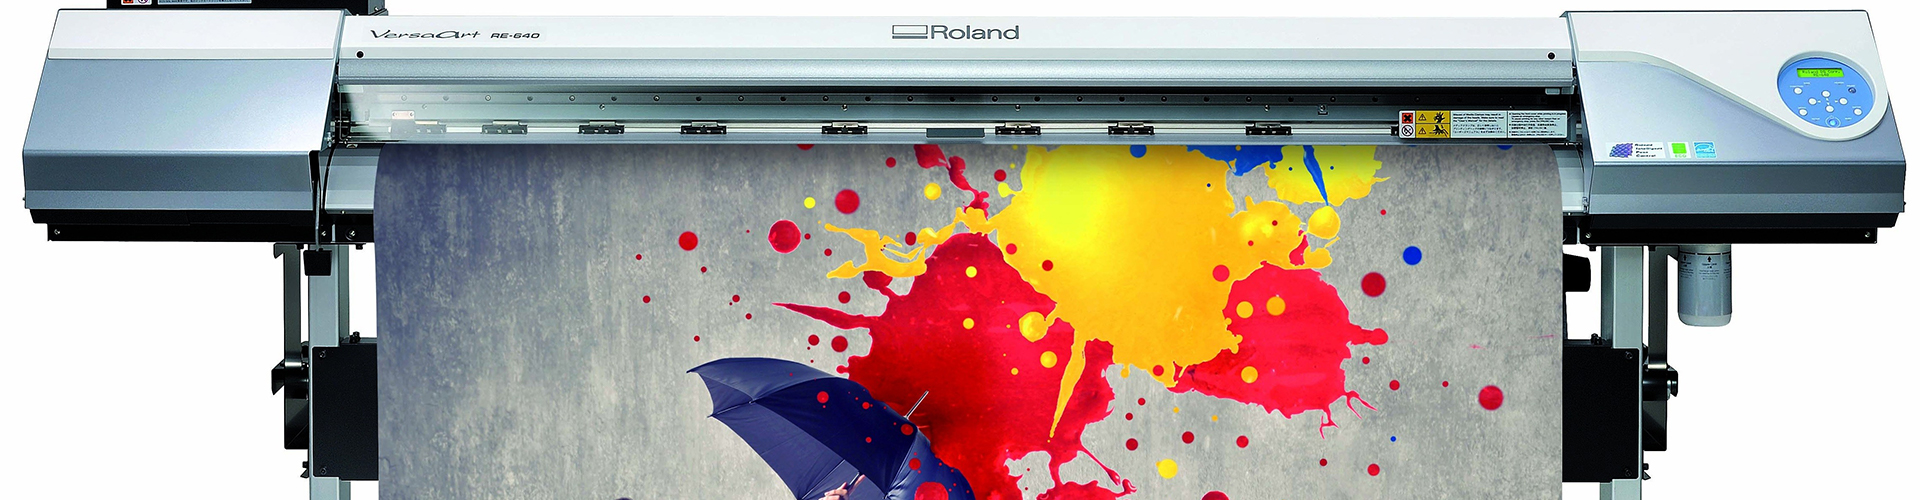 ../images/services/village-printer-full-color-wide-format-printing.jpg